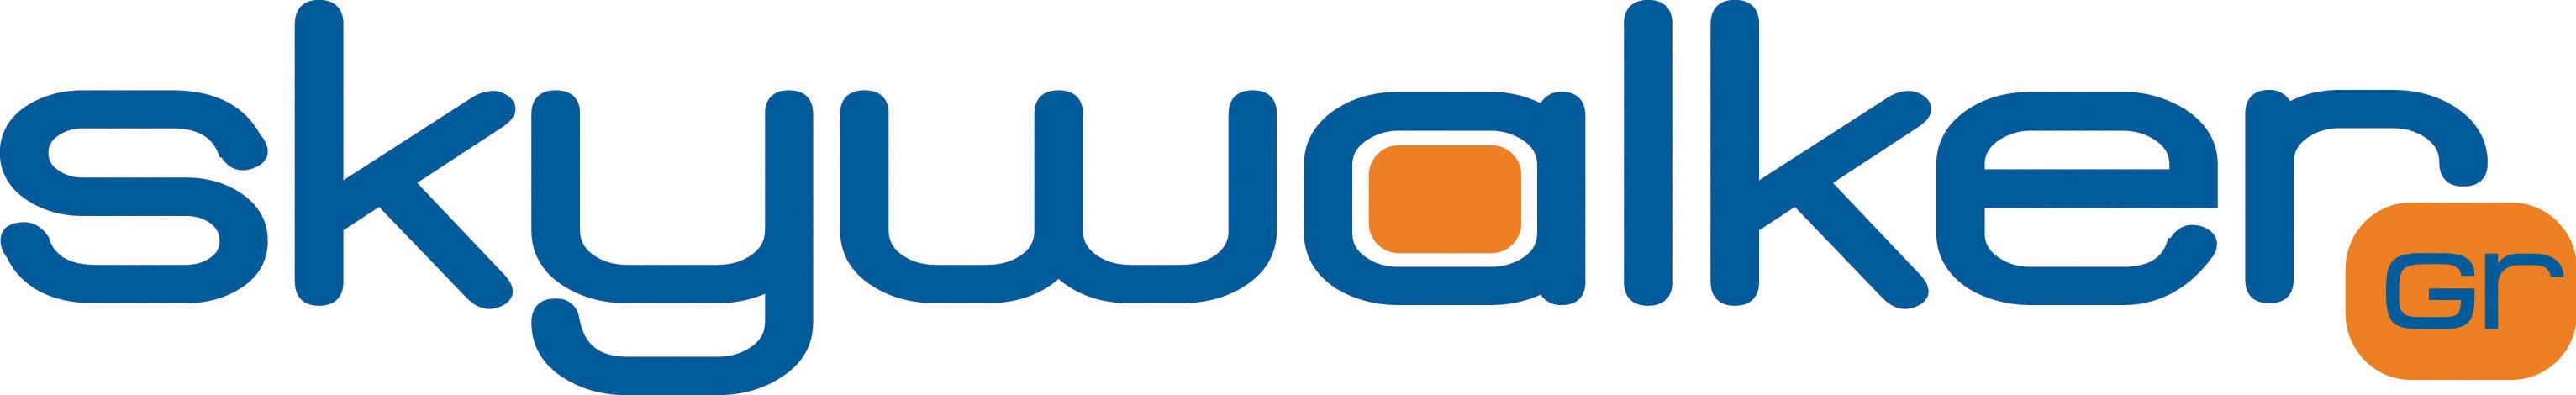 skywalker-logo